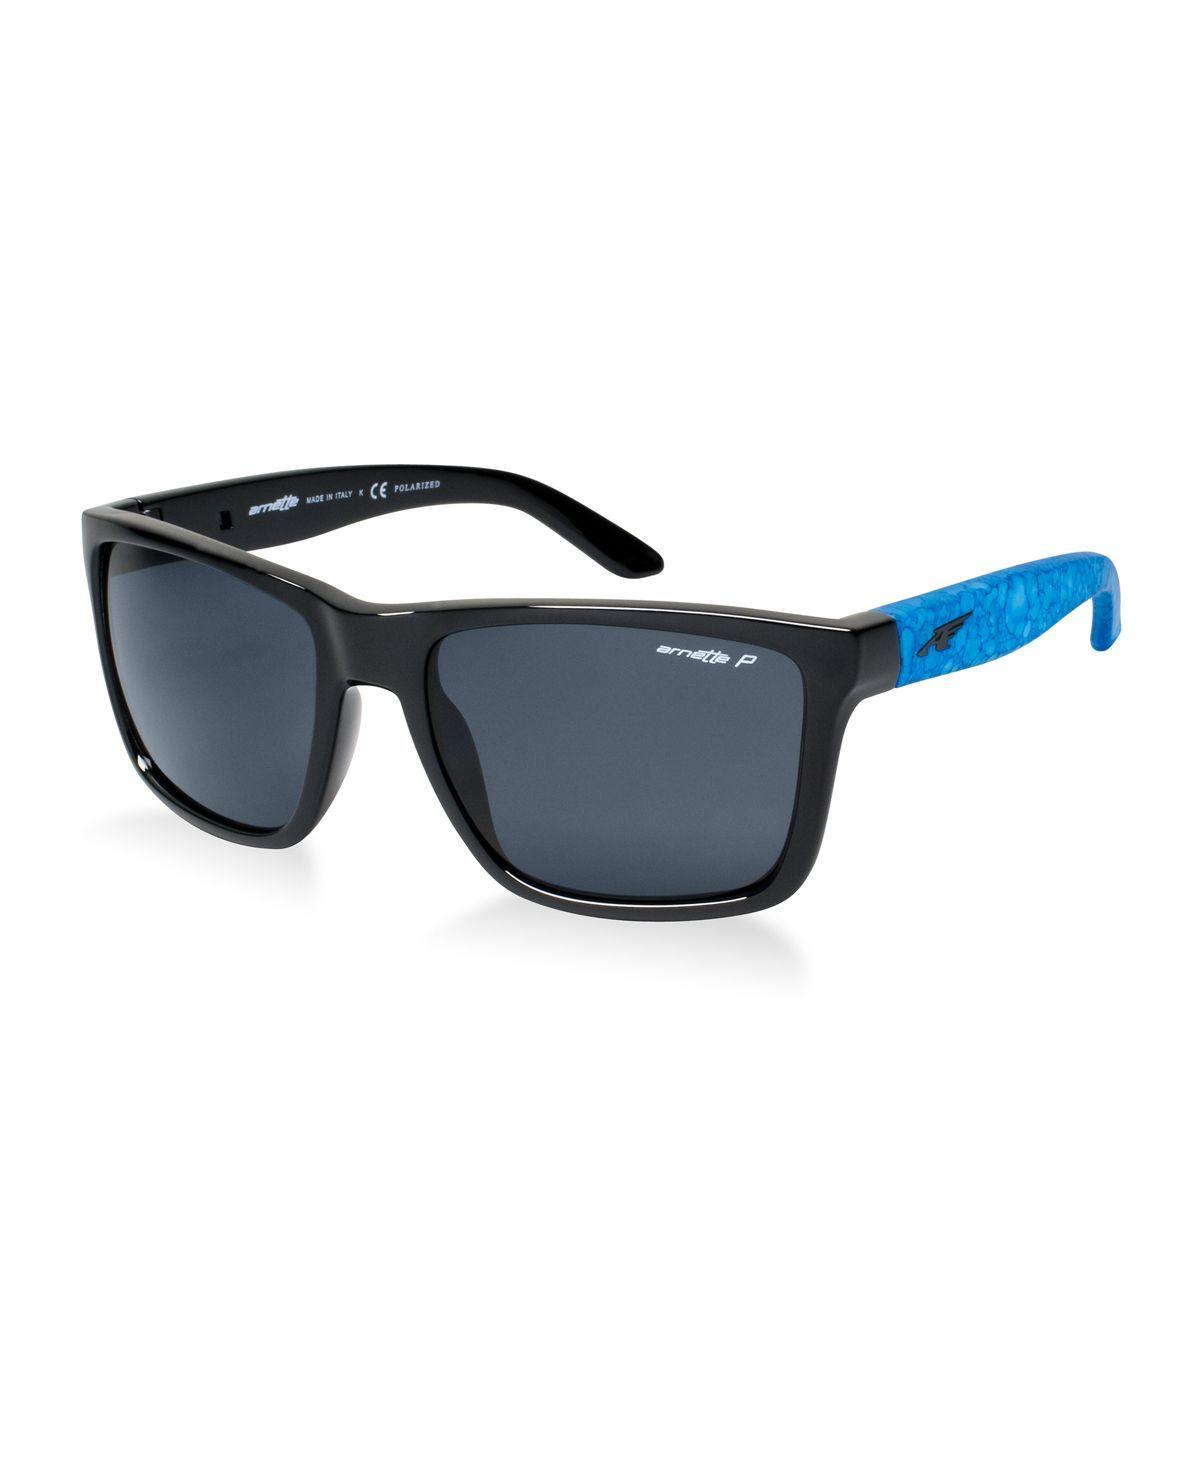 e823bb66e3 Arnette Sunglasses, AN4177 Witch Doctor Witch Doctor, Gafas De Sol De  Oakley, Gafas